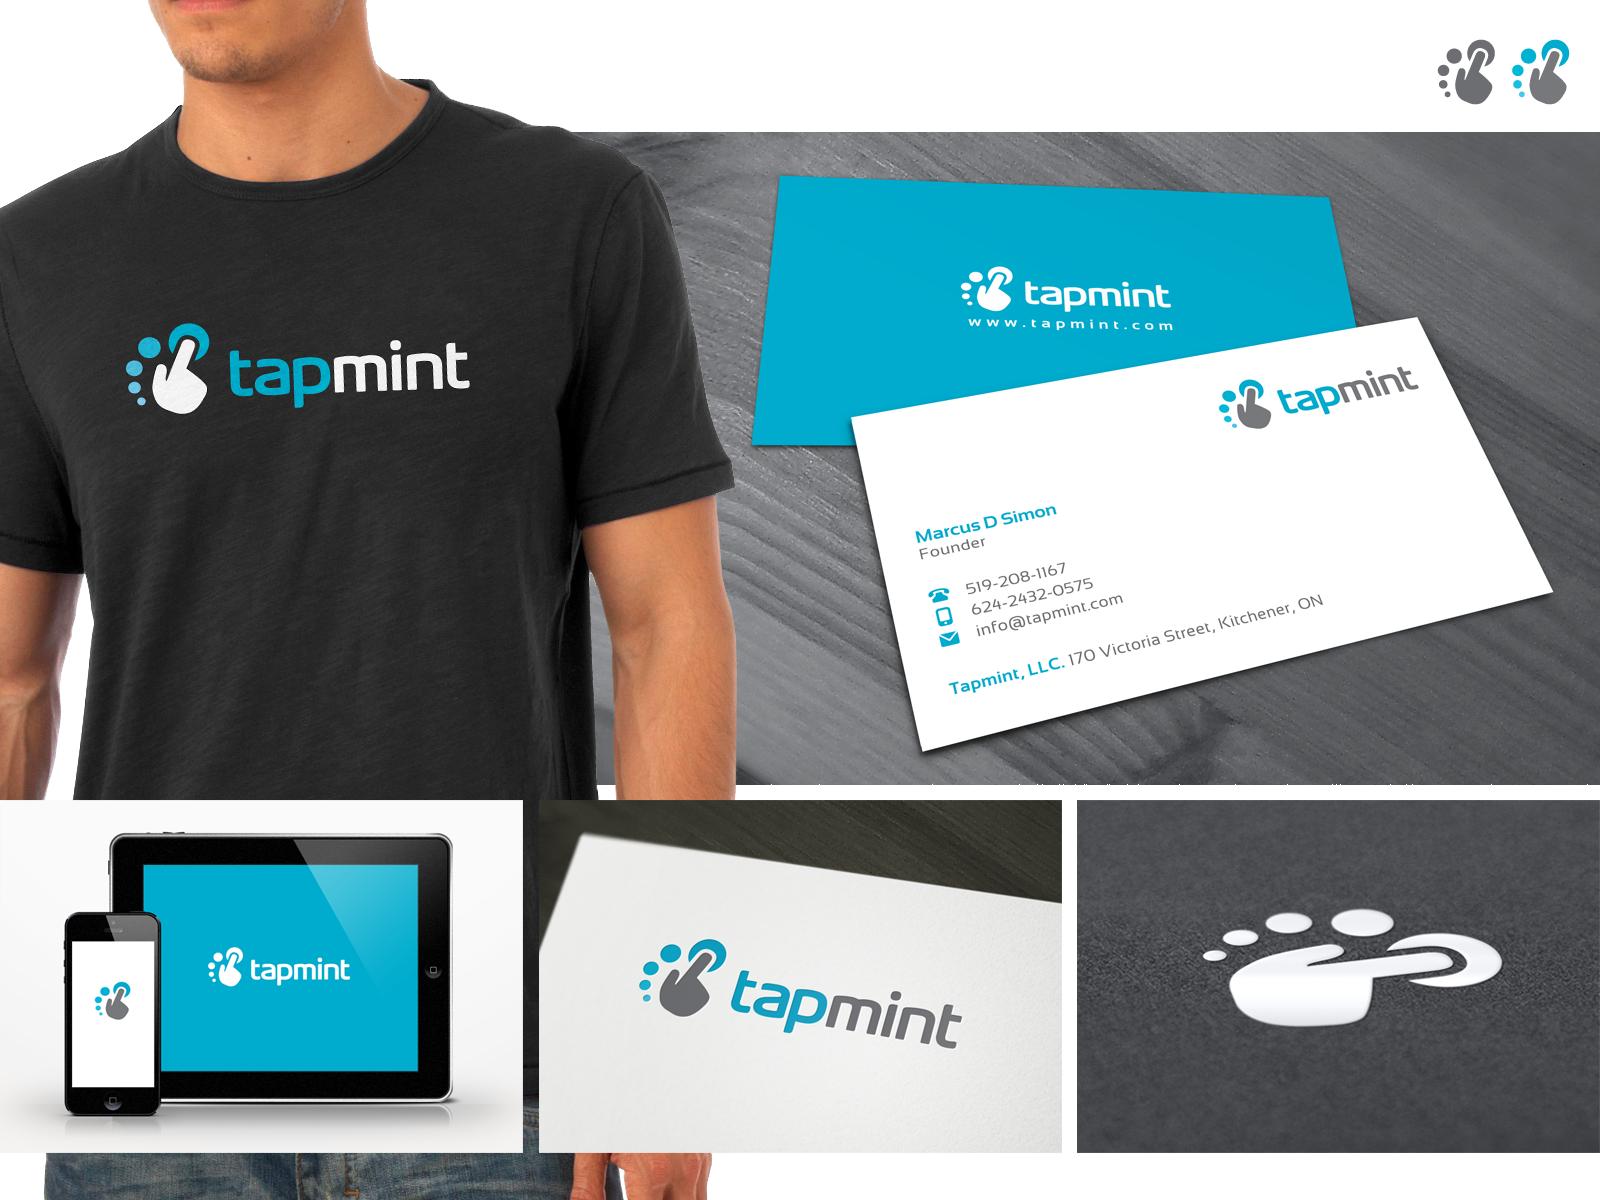 Design a logo for an innovative digital services company